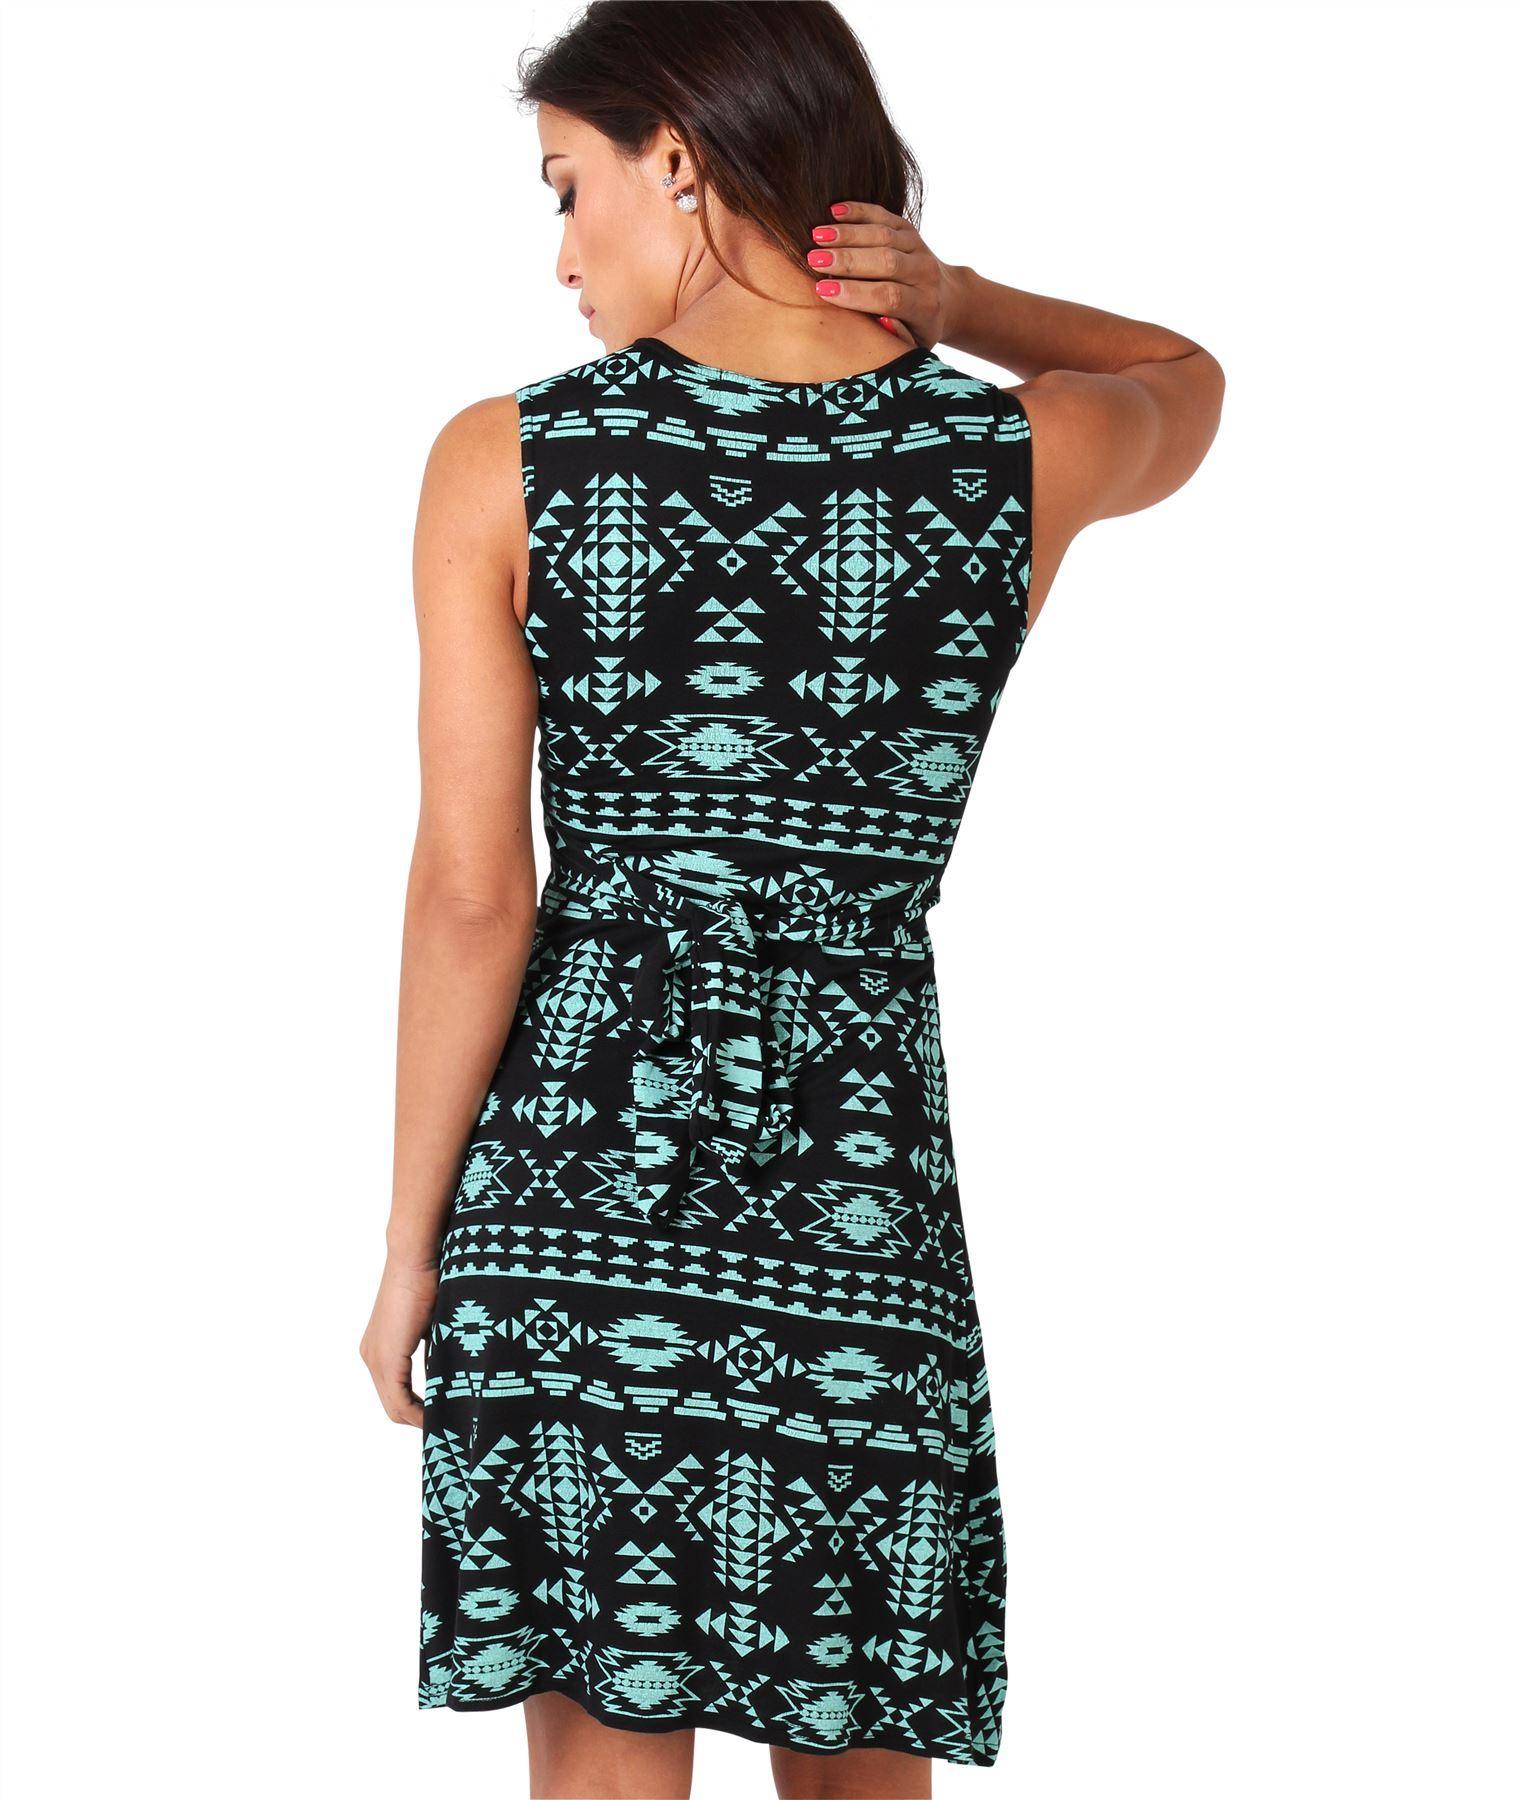 Womens-V-Neck-Mini-Dress-Small-Sizes-Short-Skirt-Tribal-Print-Front-Knot-Party thumbnail 22